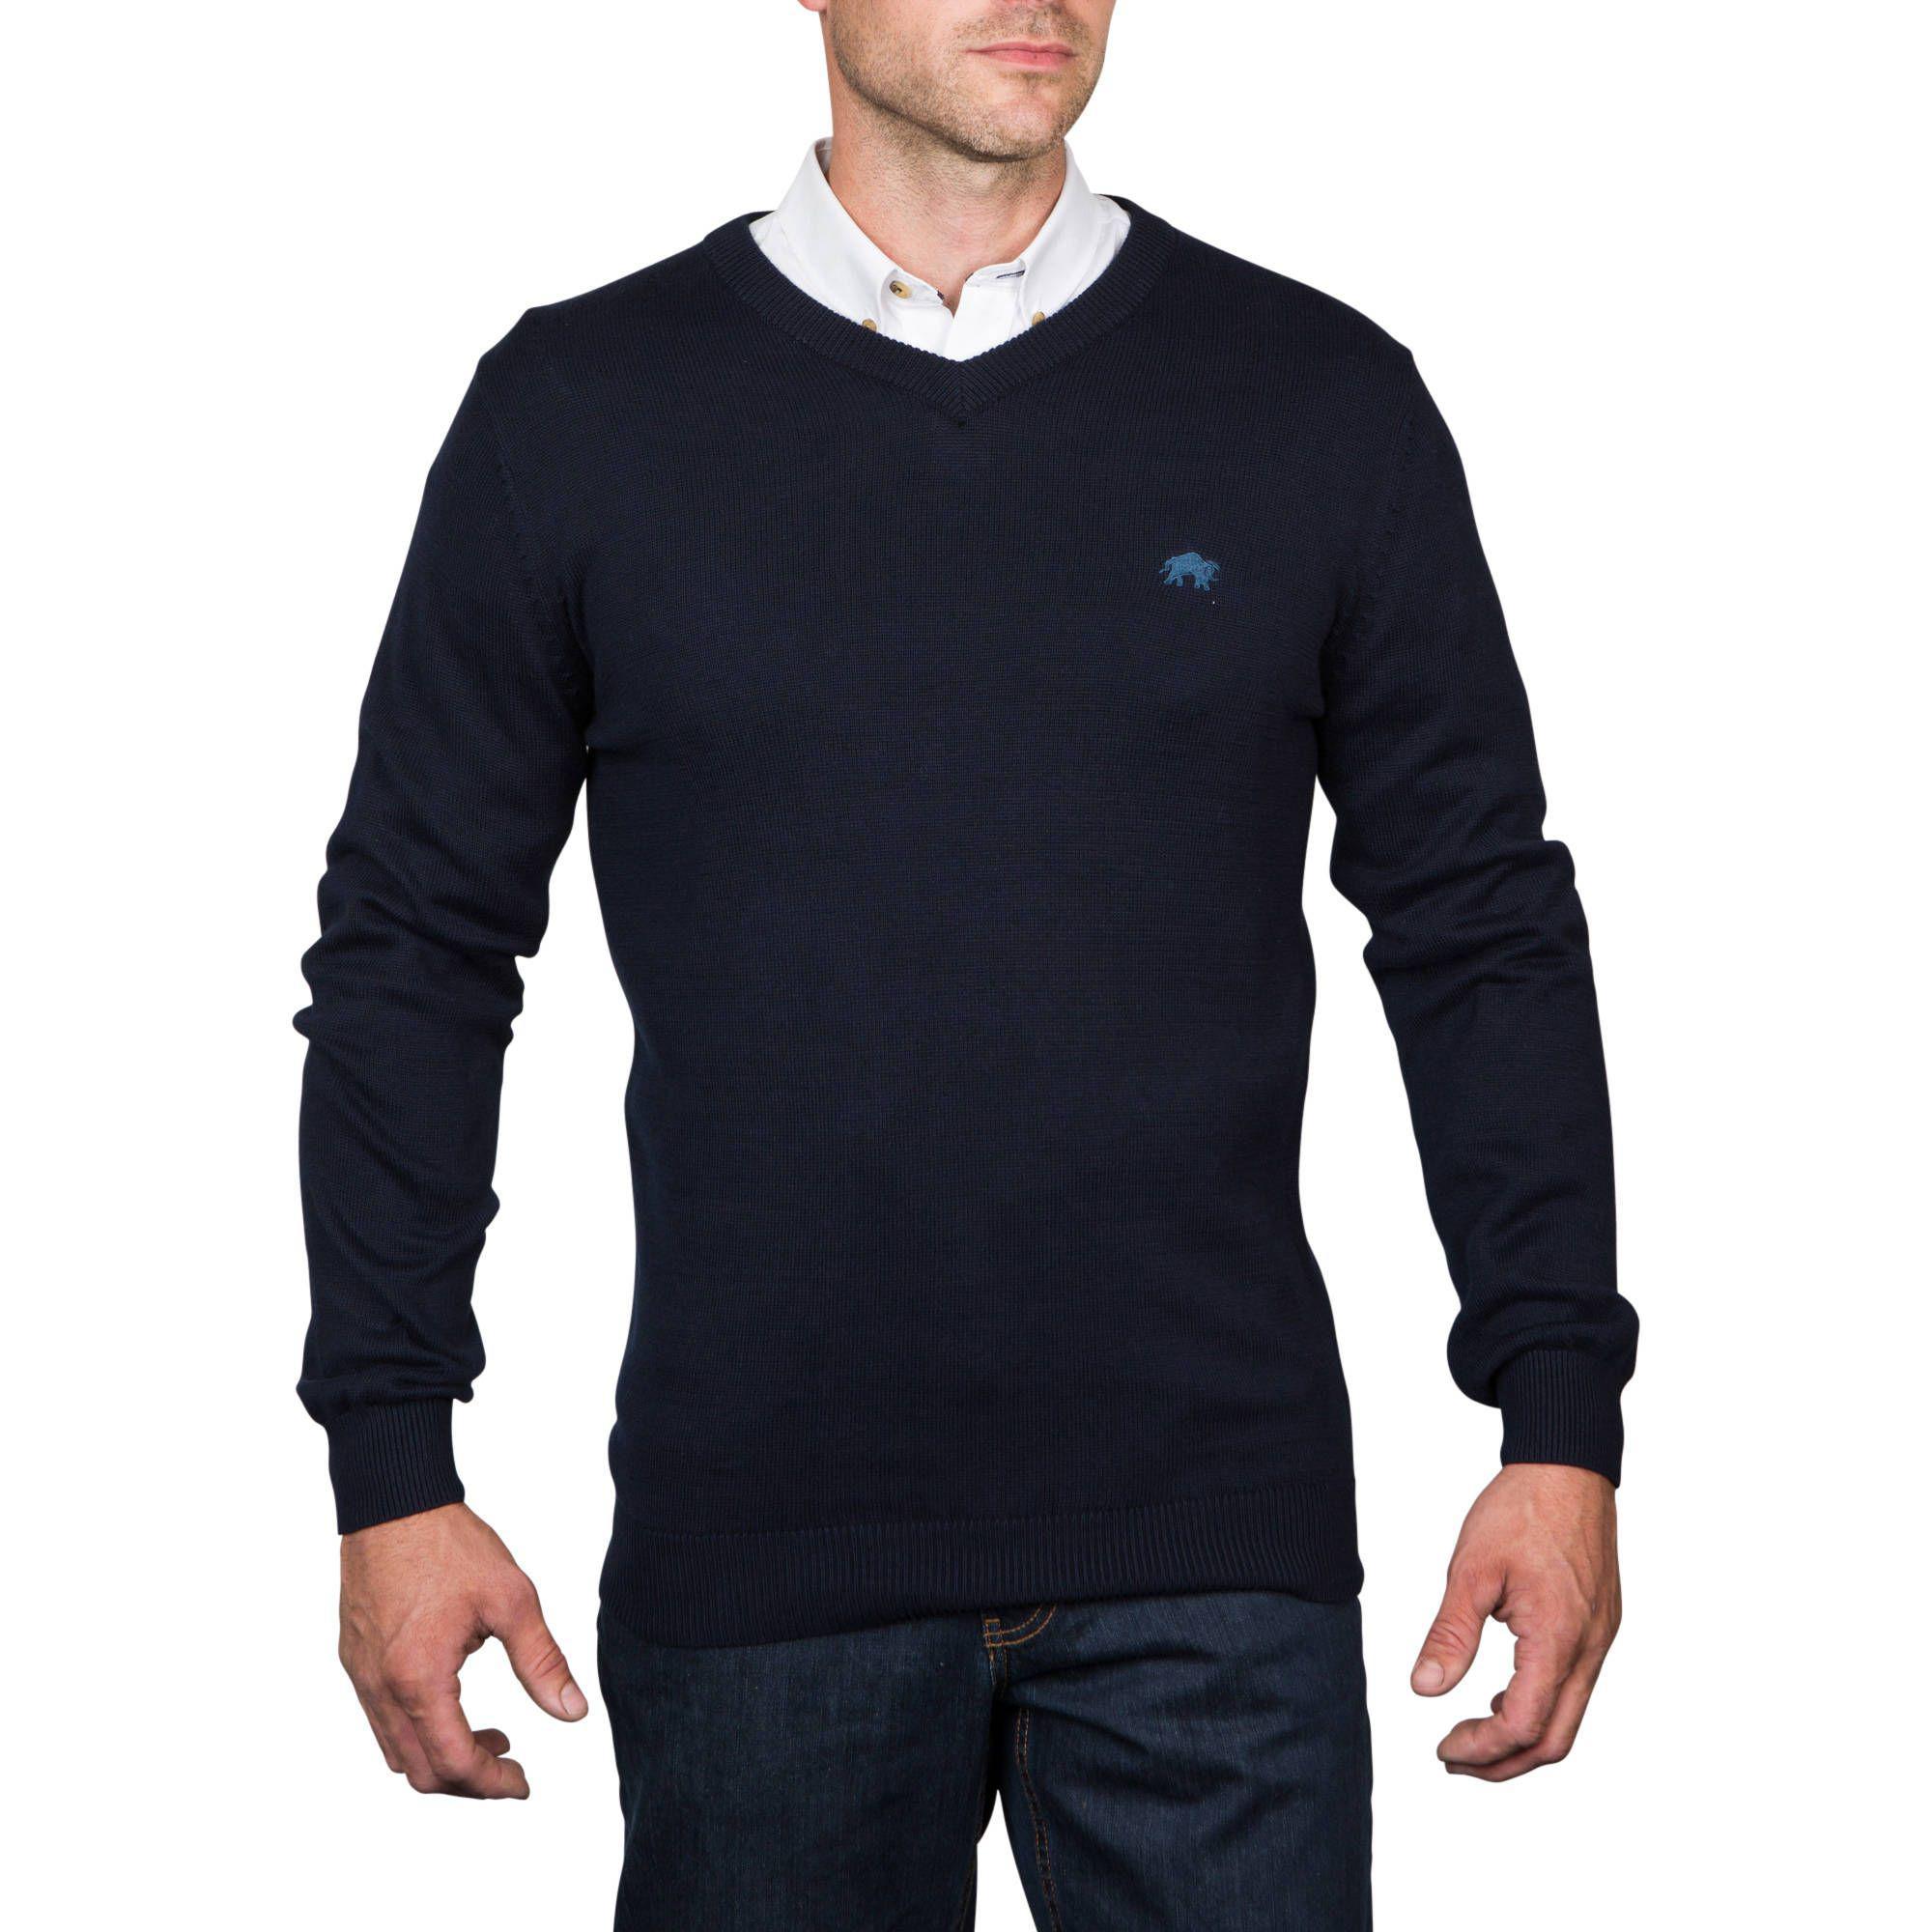 62f5730026bda0 ... Raging Bull - Blue V-neck Cotton/cashmere Sweater Navy for Men - Lyst.  Visit Debenhams. Tap to visit site